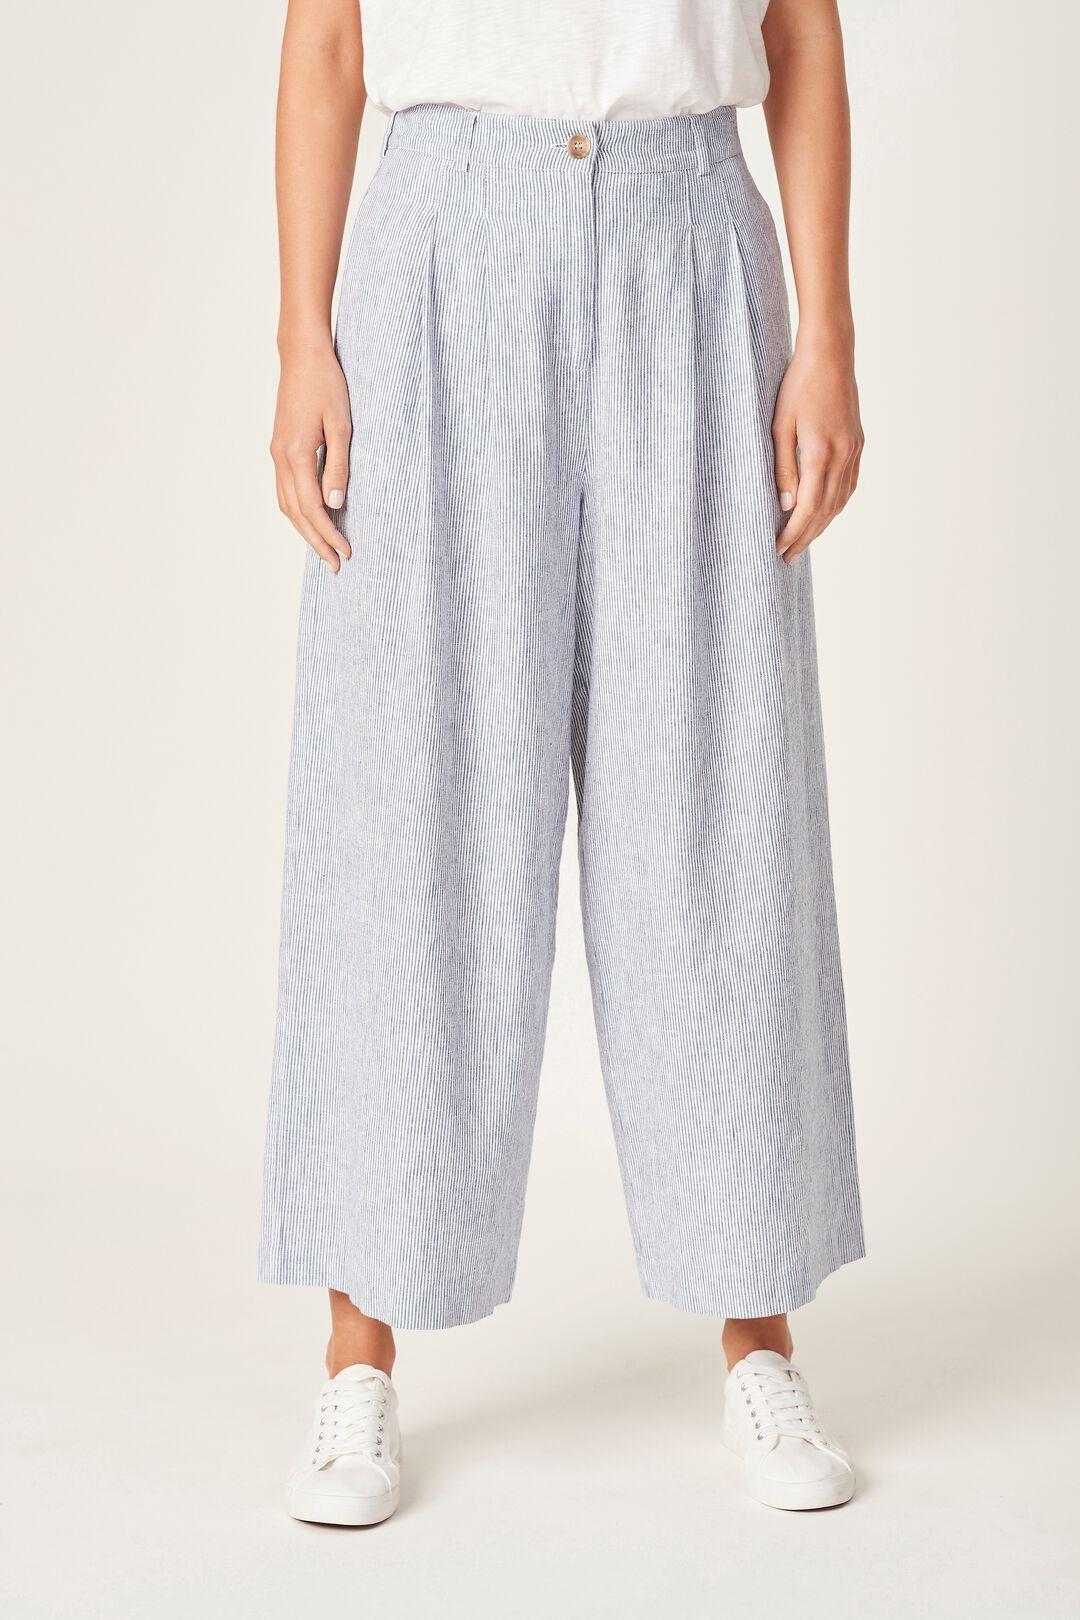 LINEN WIDE LEG PANT  NAVY/WHITE  hi-res